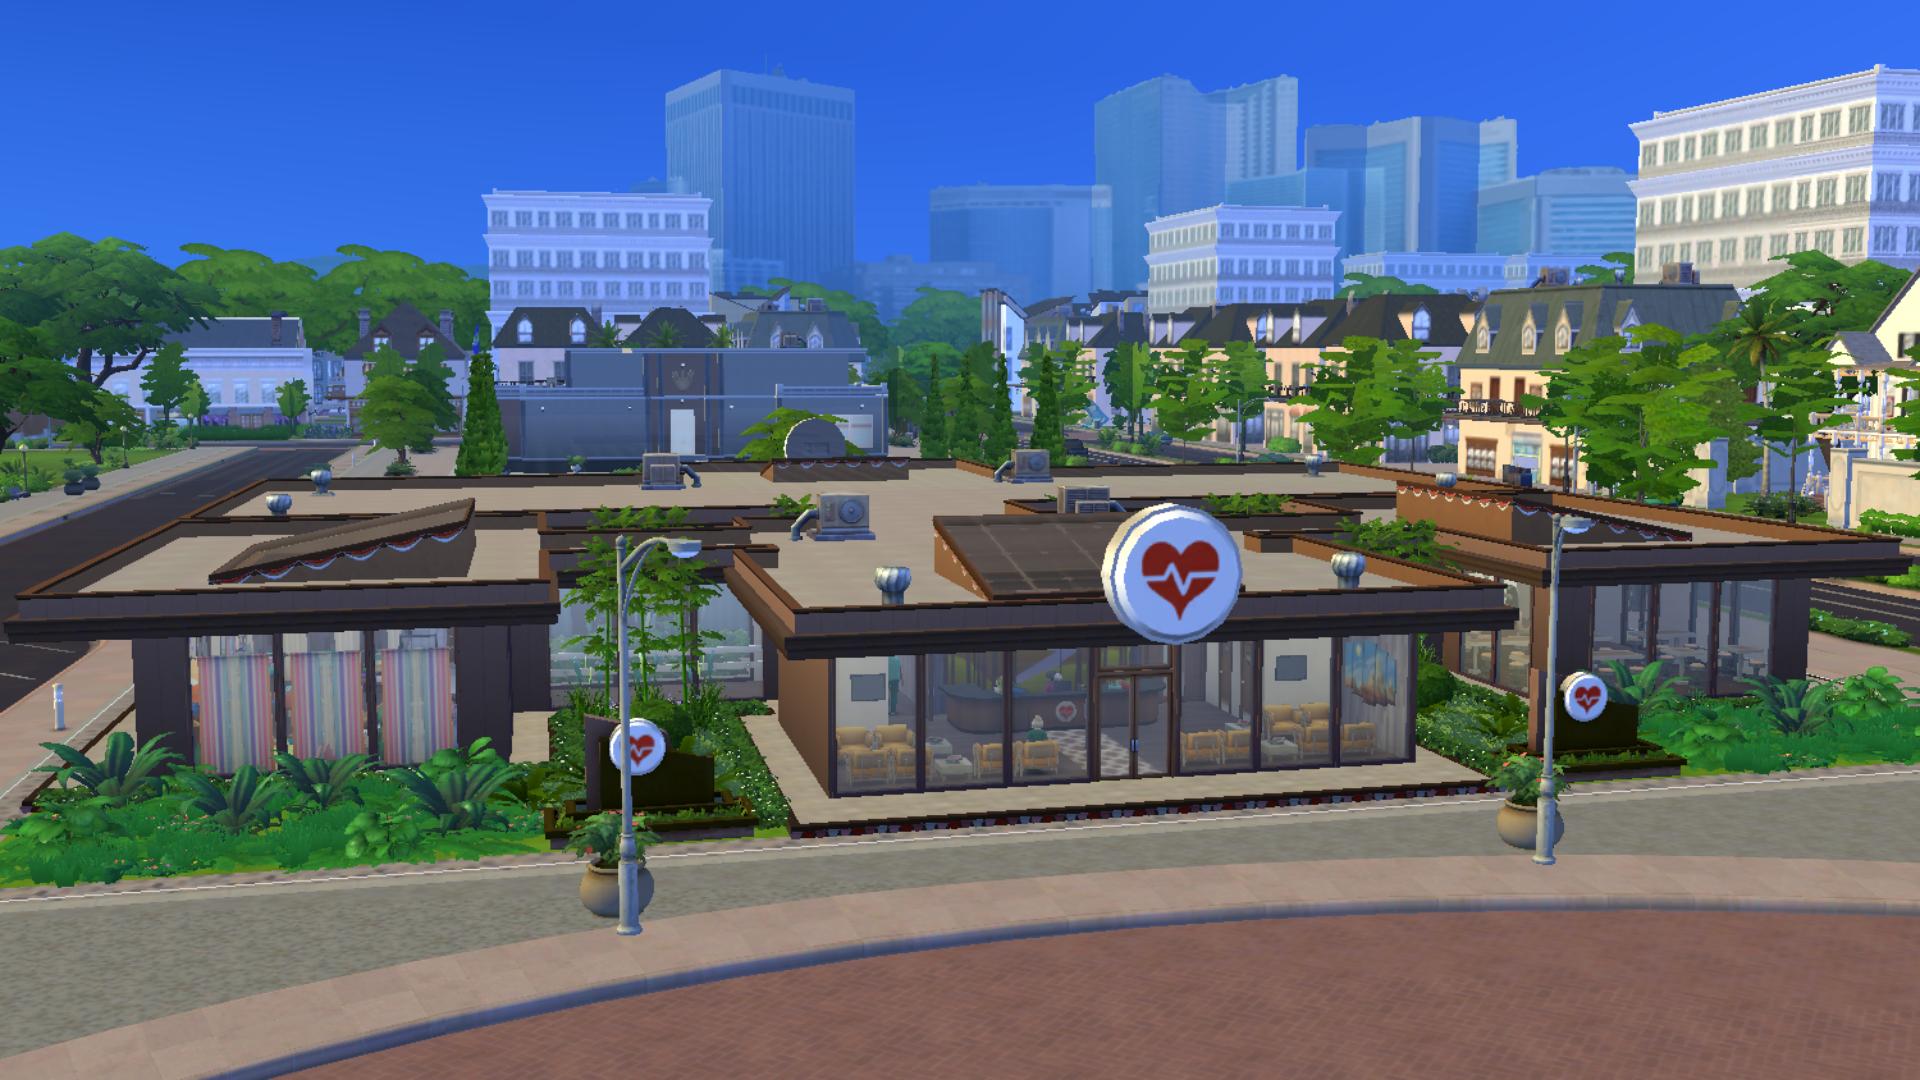 Sims 4 mod hospital by xmathyx